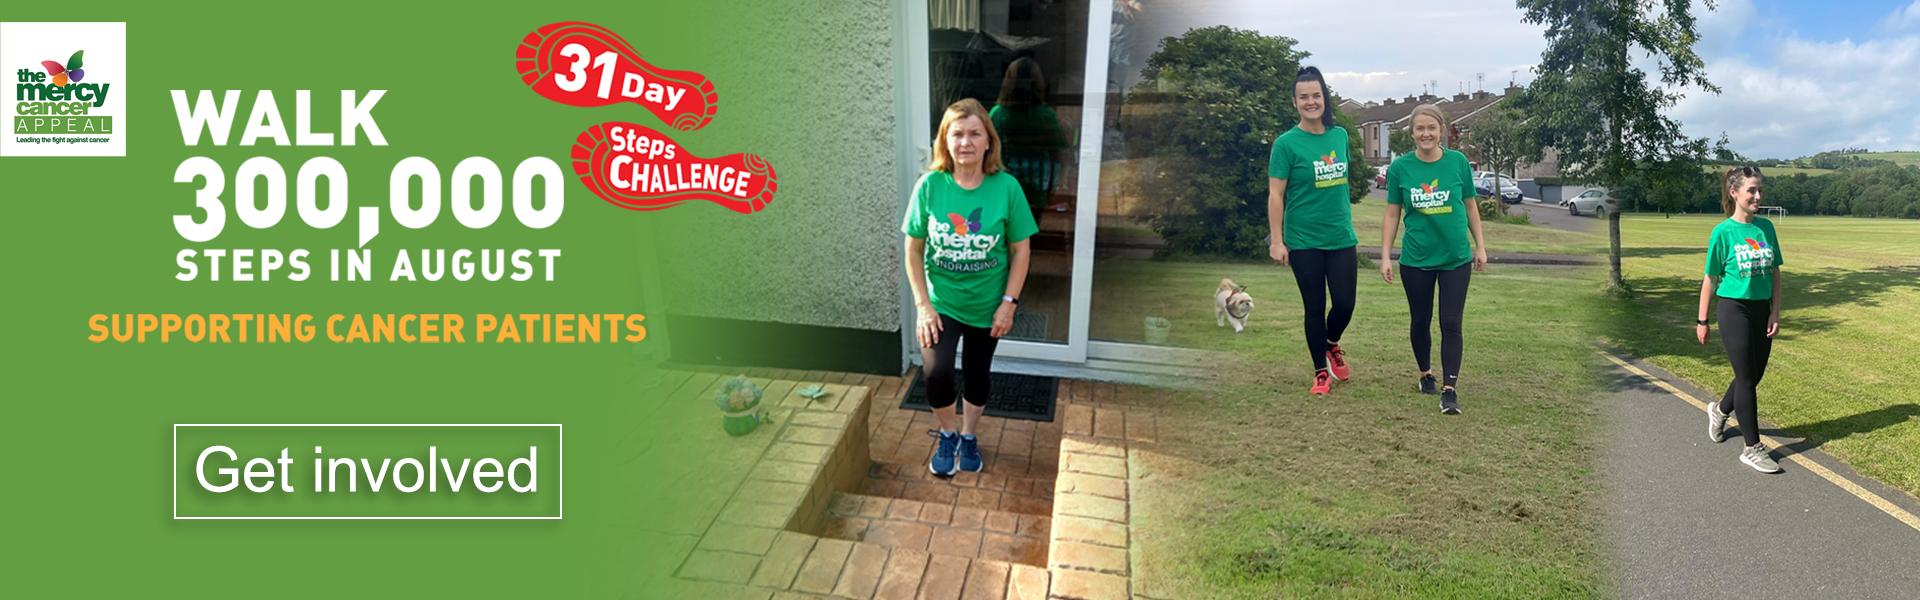 300,000 Steps Challenge August